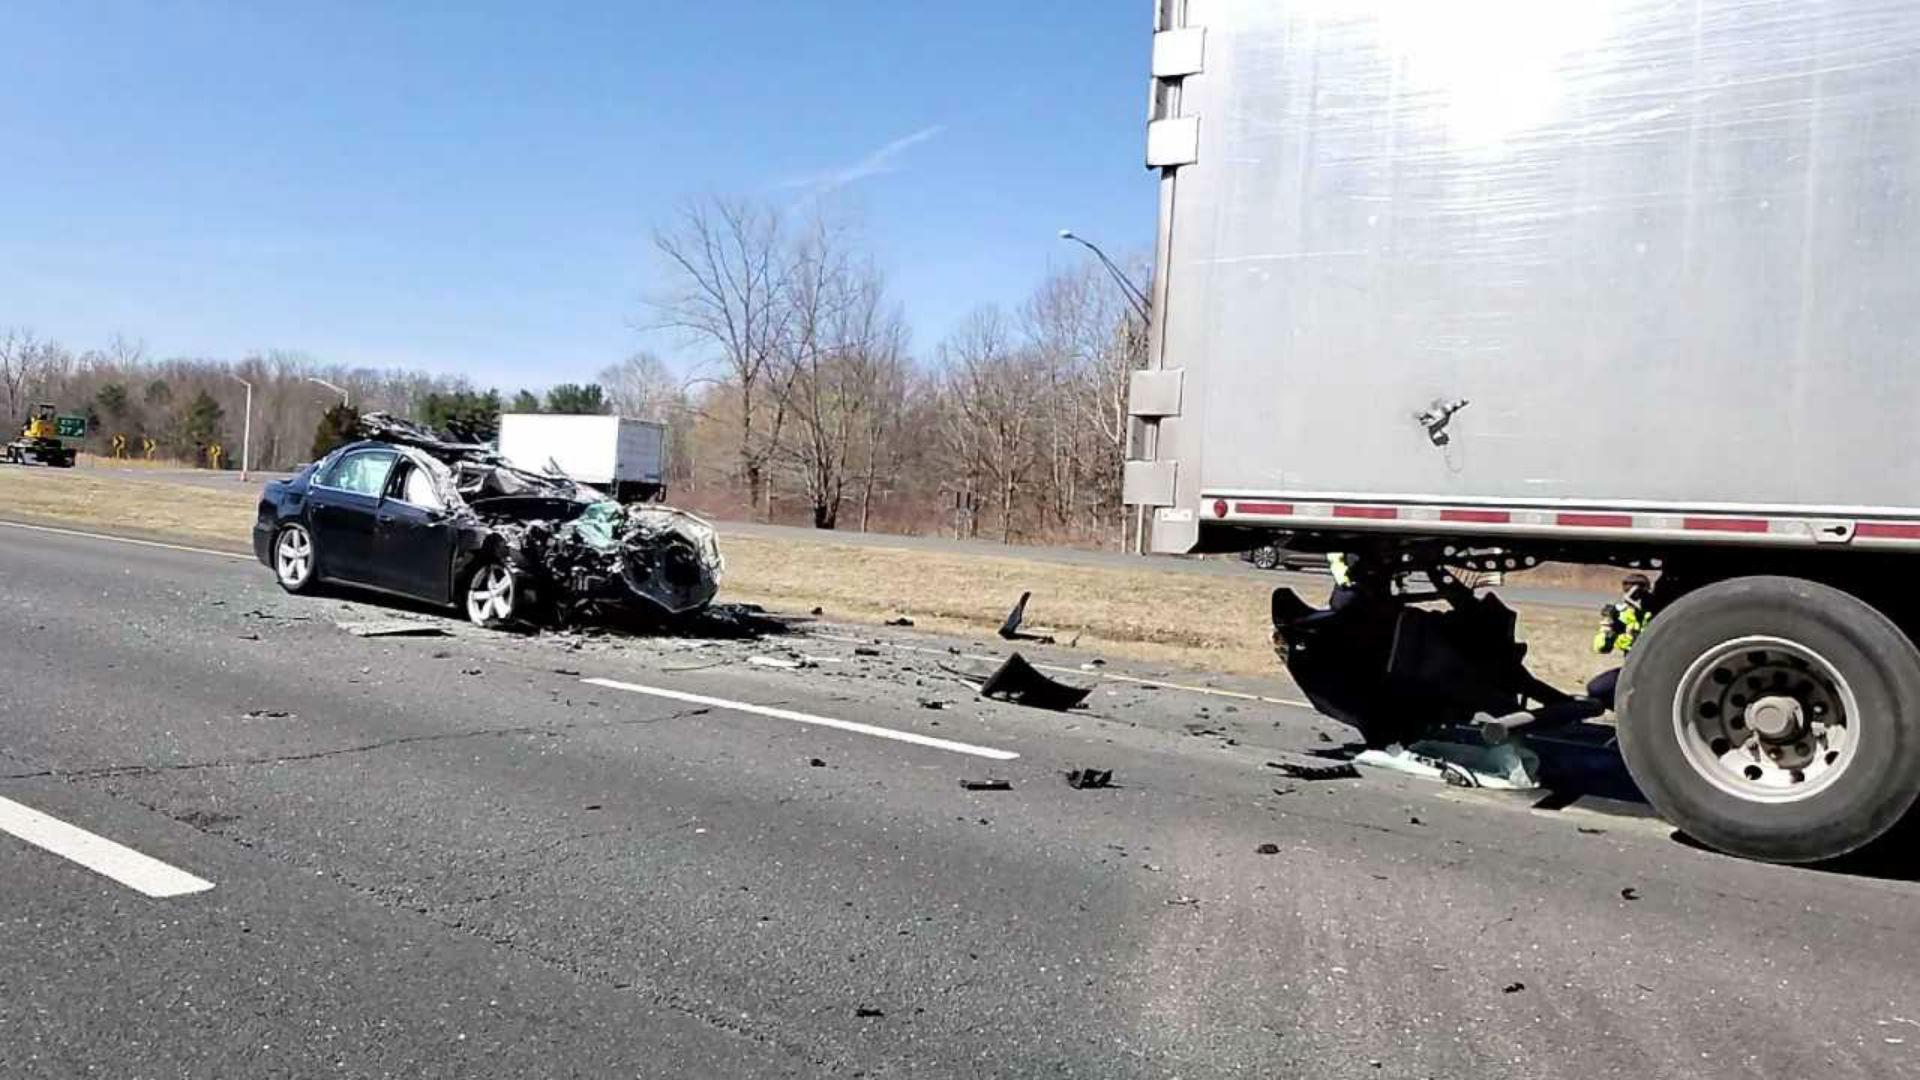 Officials identify victim of fatal crash on I-84 East in